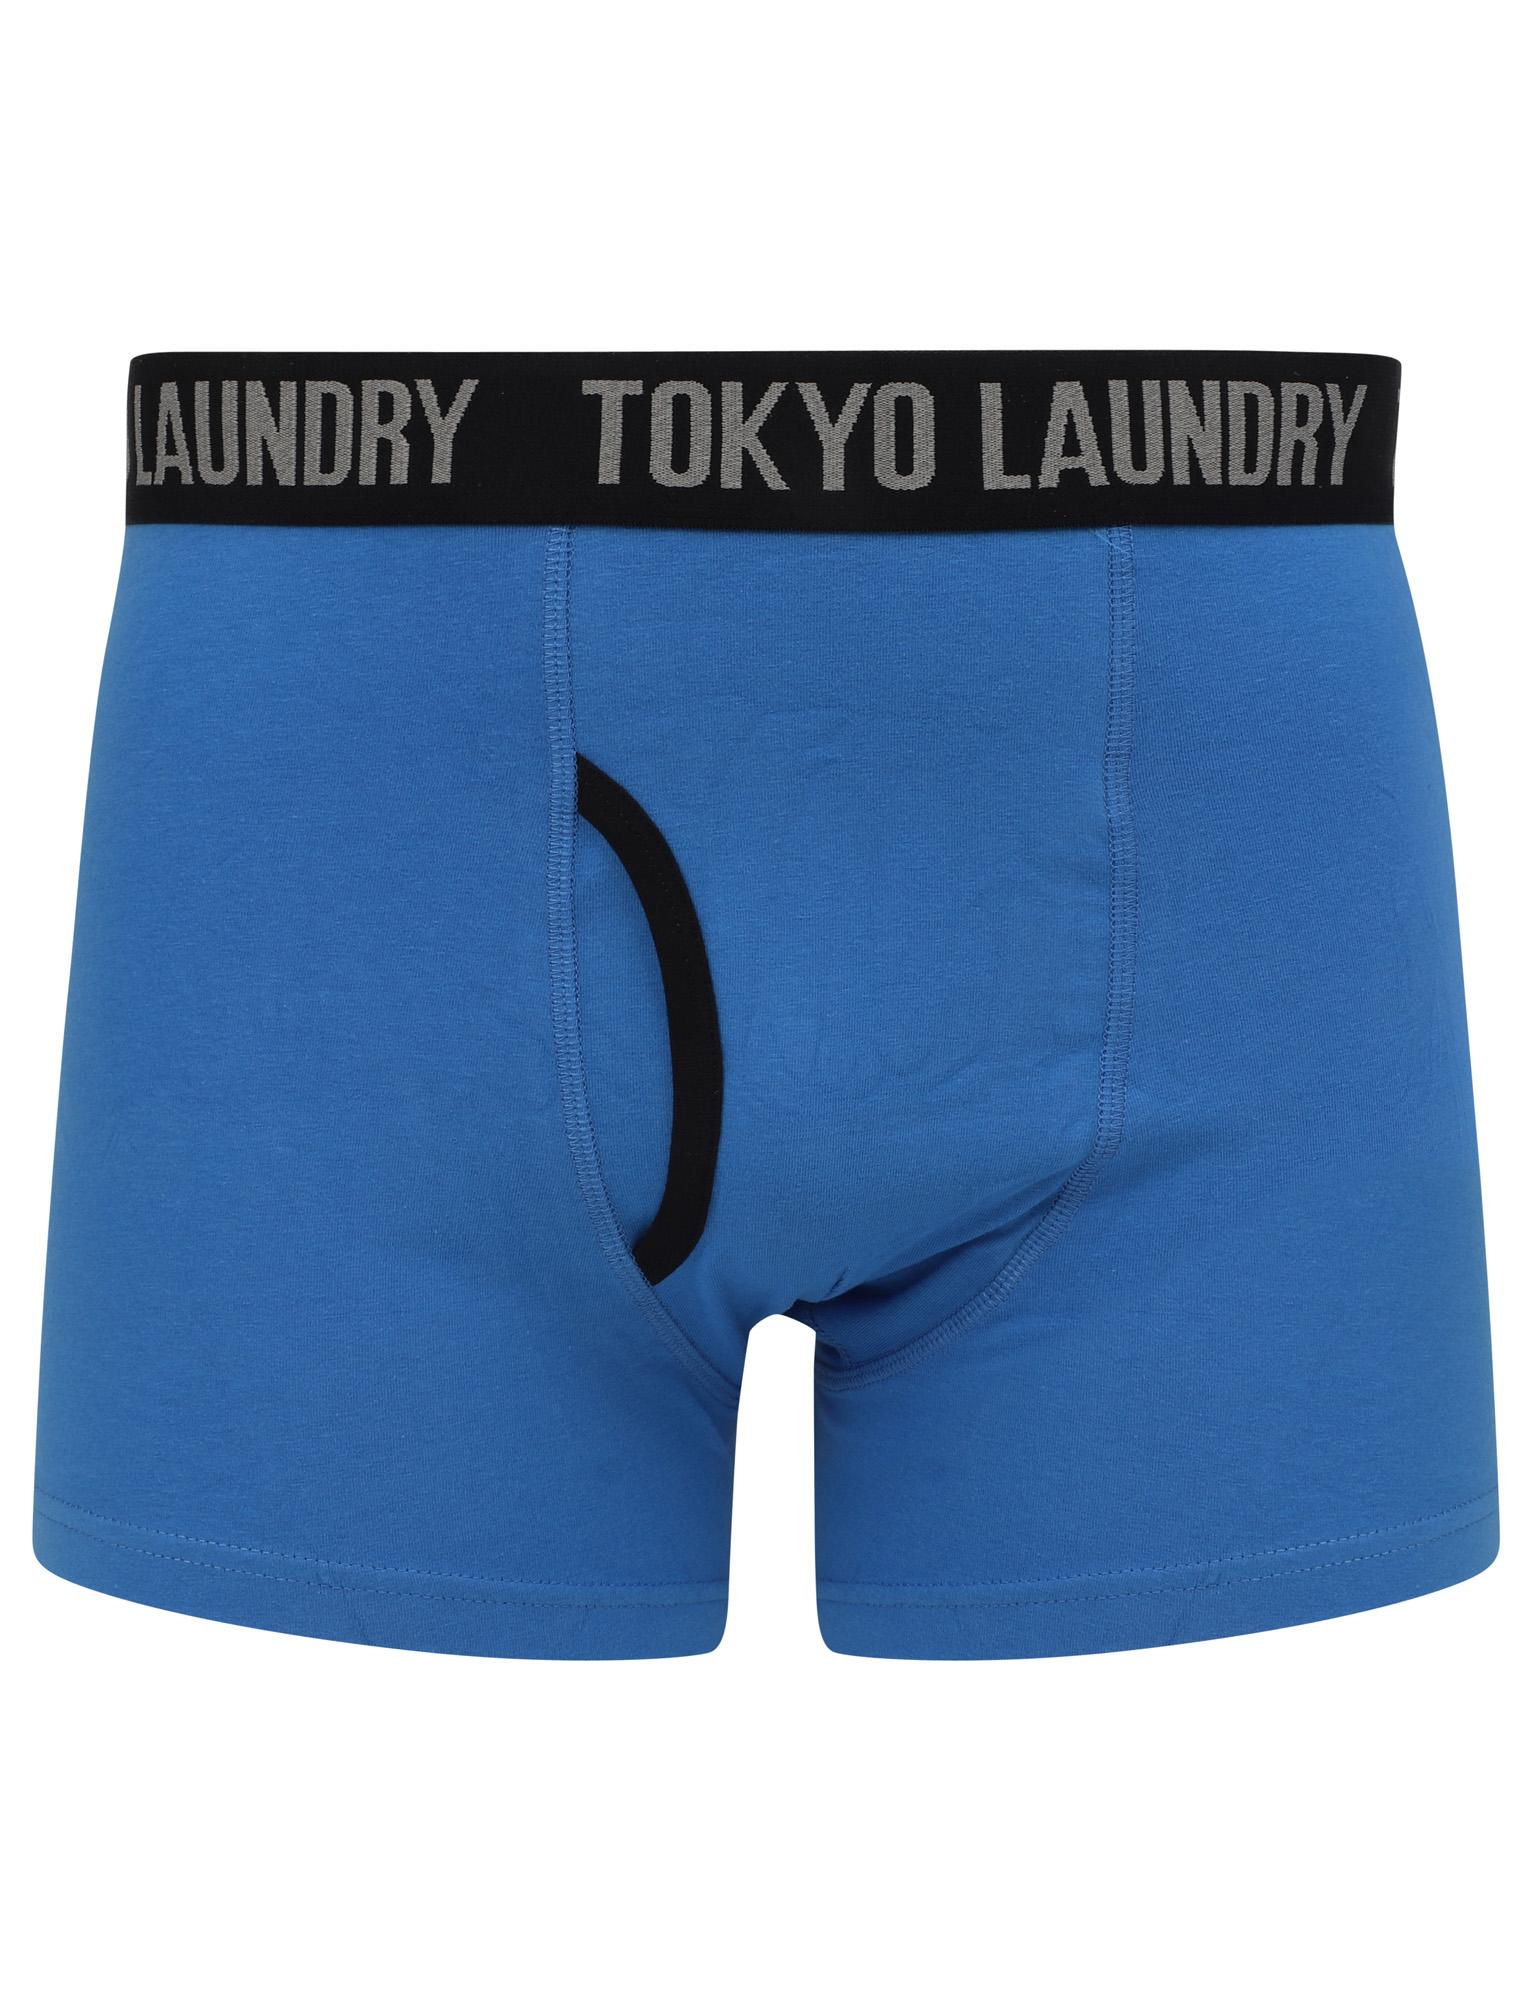 New-Mens-Tokyo-Laundry-2-Pack-Cotton-Rich-Boxer-Shorts-Set-Trunks-Size-S-XXL thumbnail 5